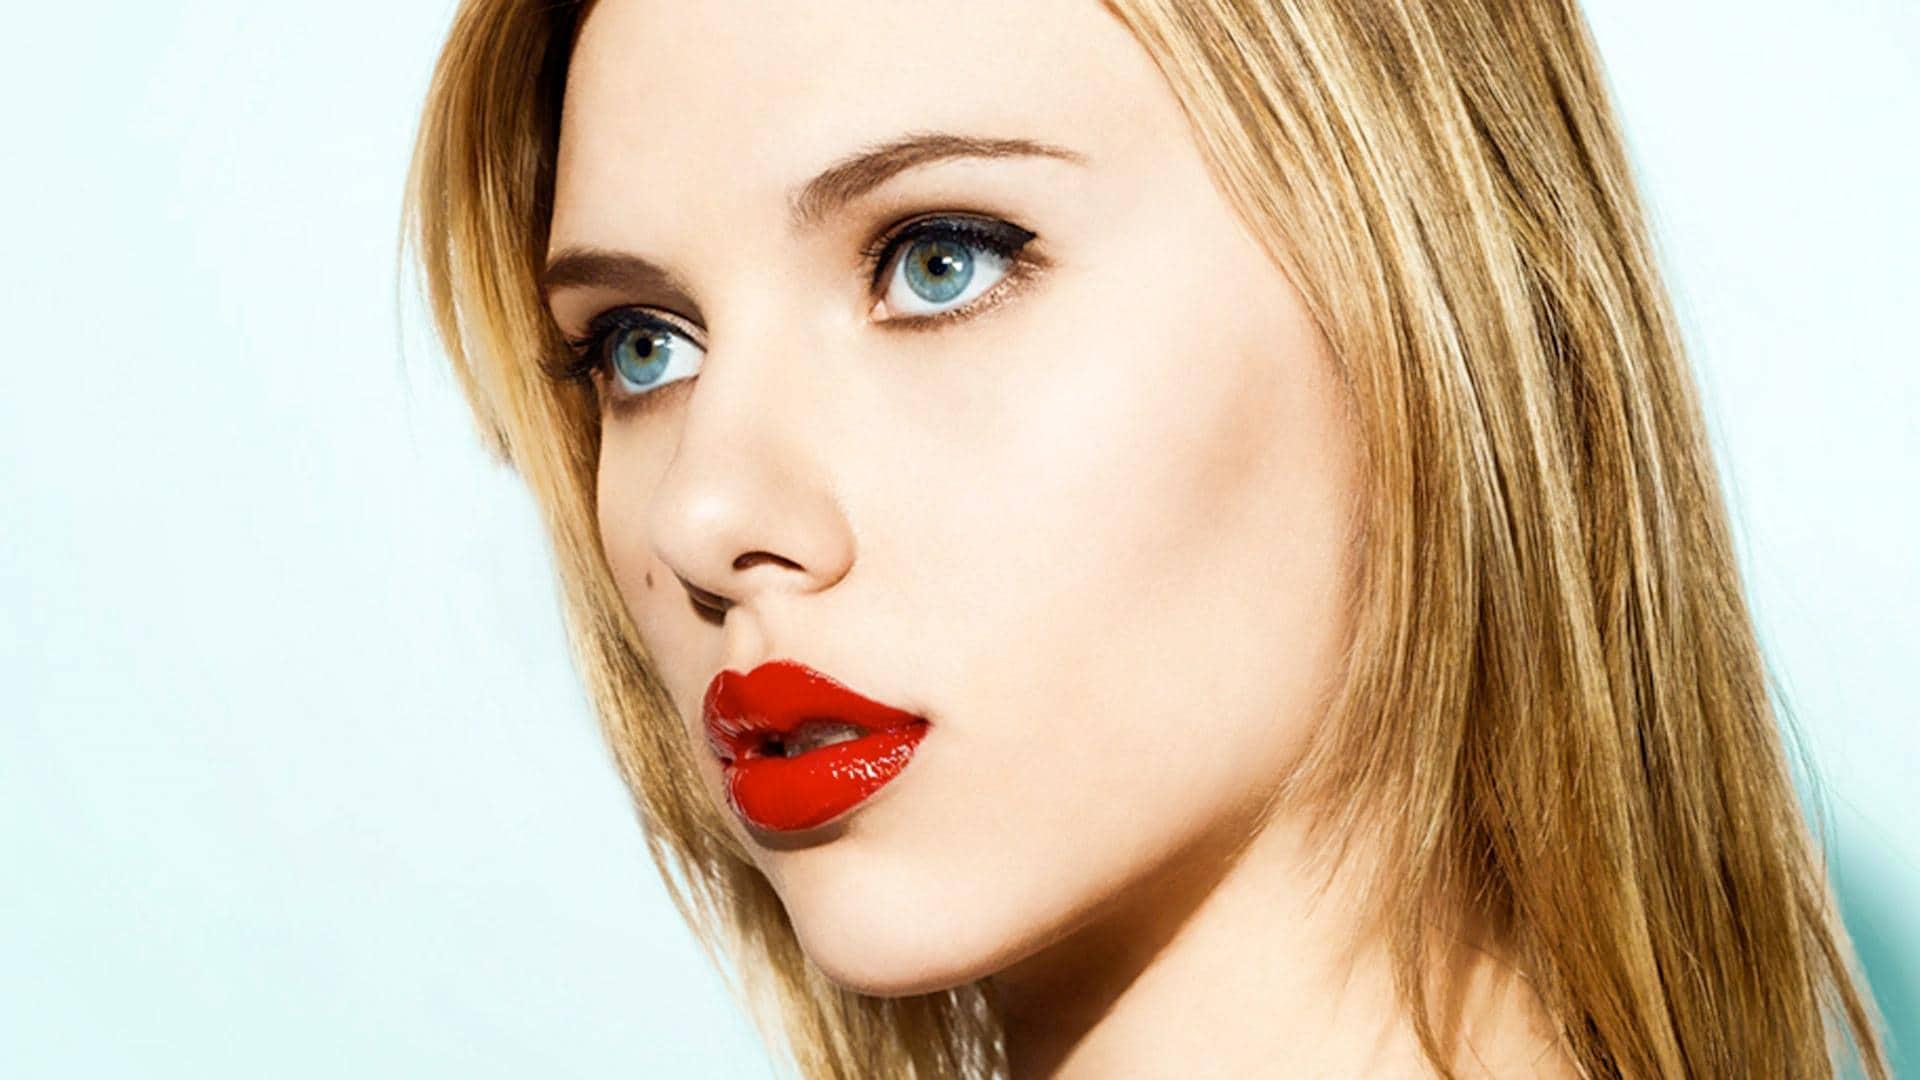 Scarlett Johansson: January 14, 2006